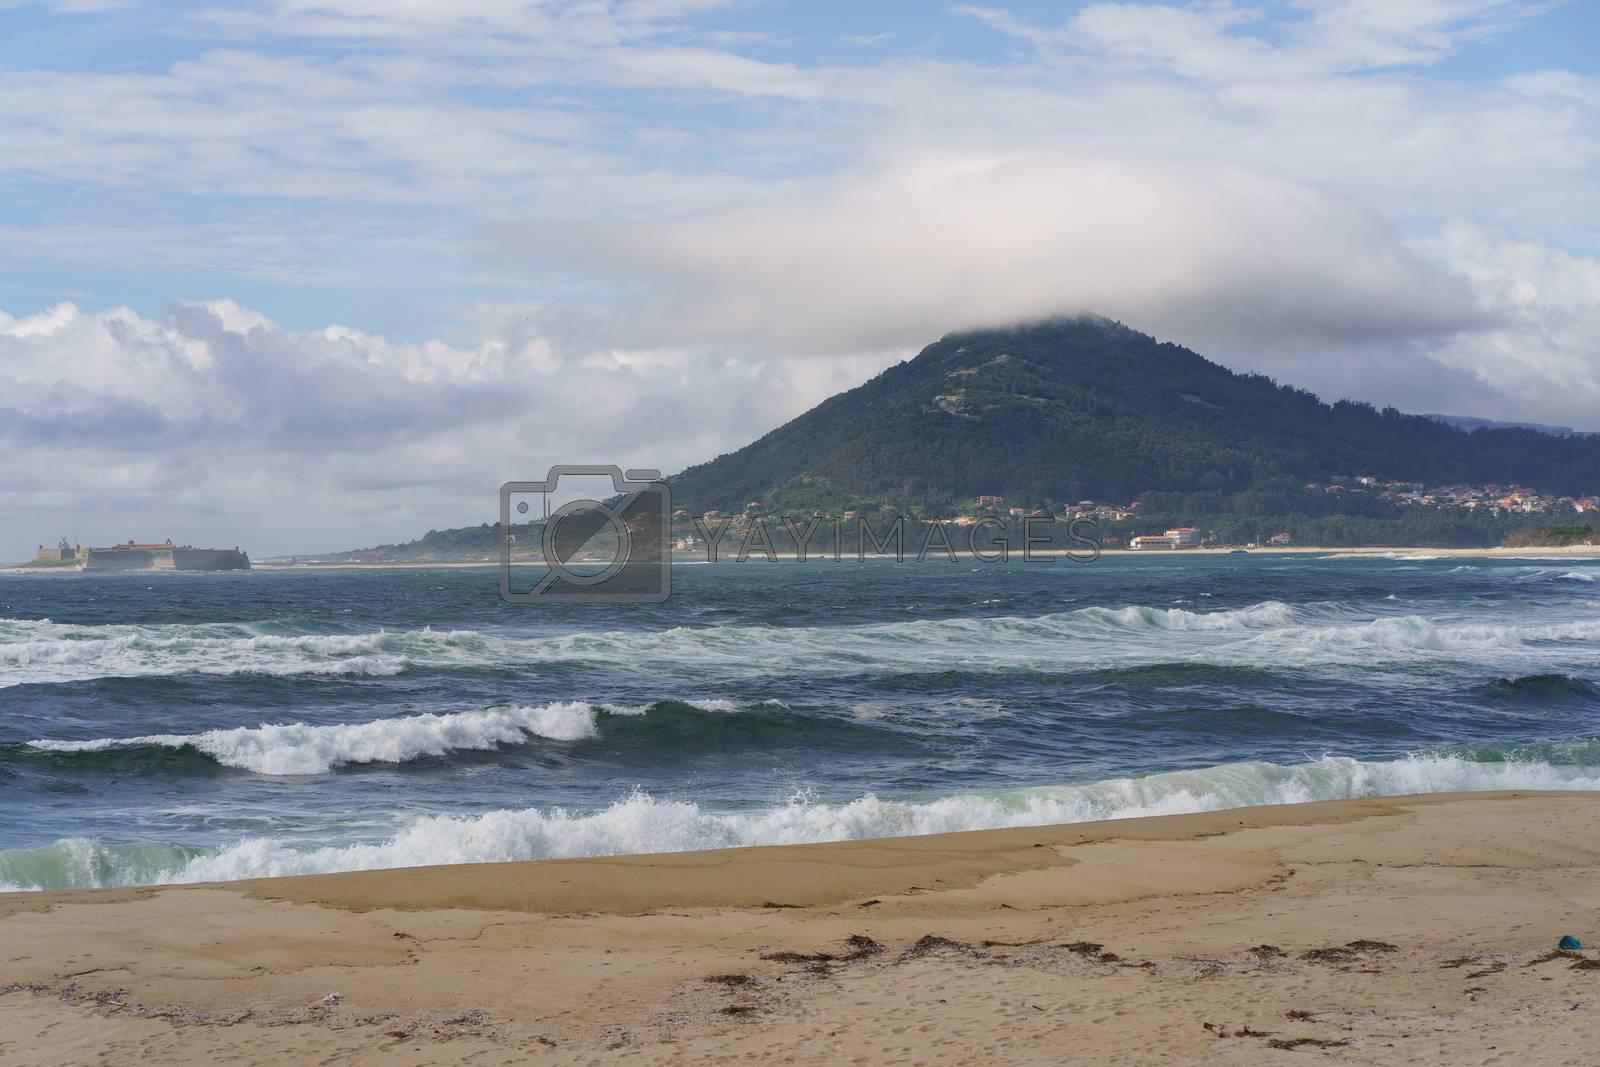 The Atlantic shore of Portugal